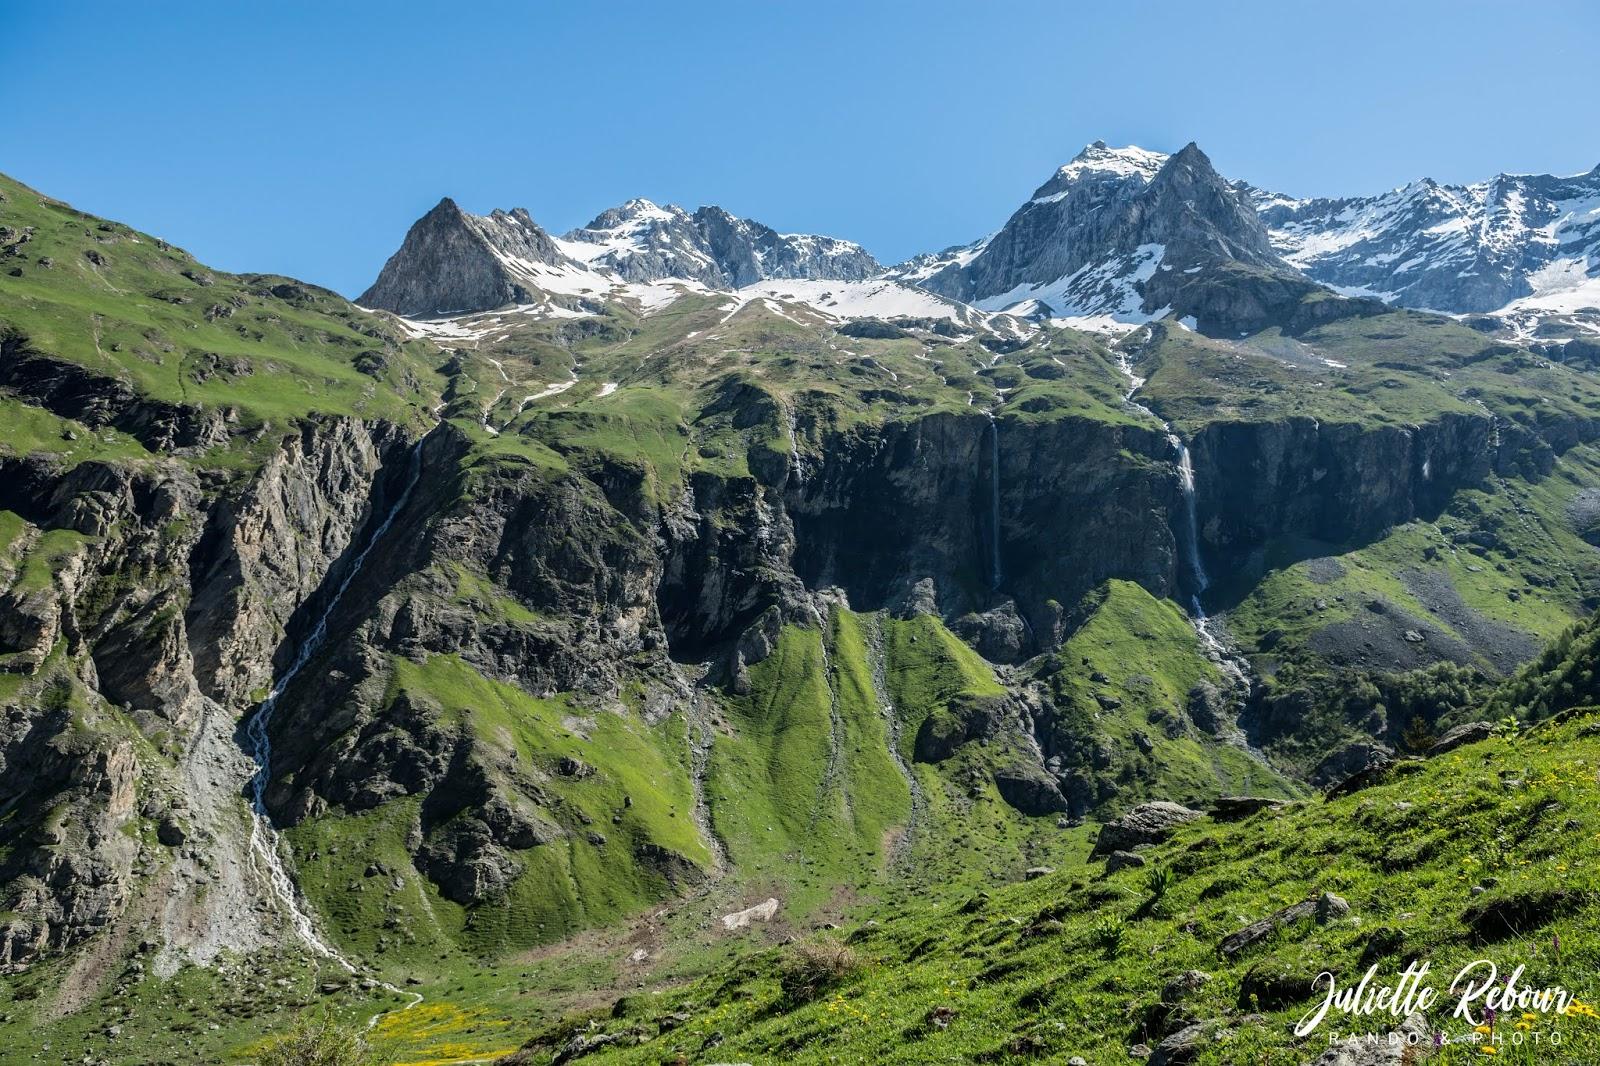 Cascades de Nant Putor, Savoie